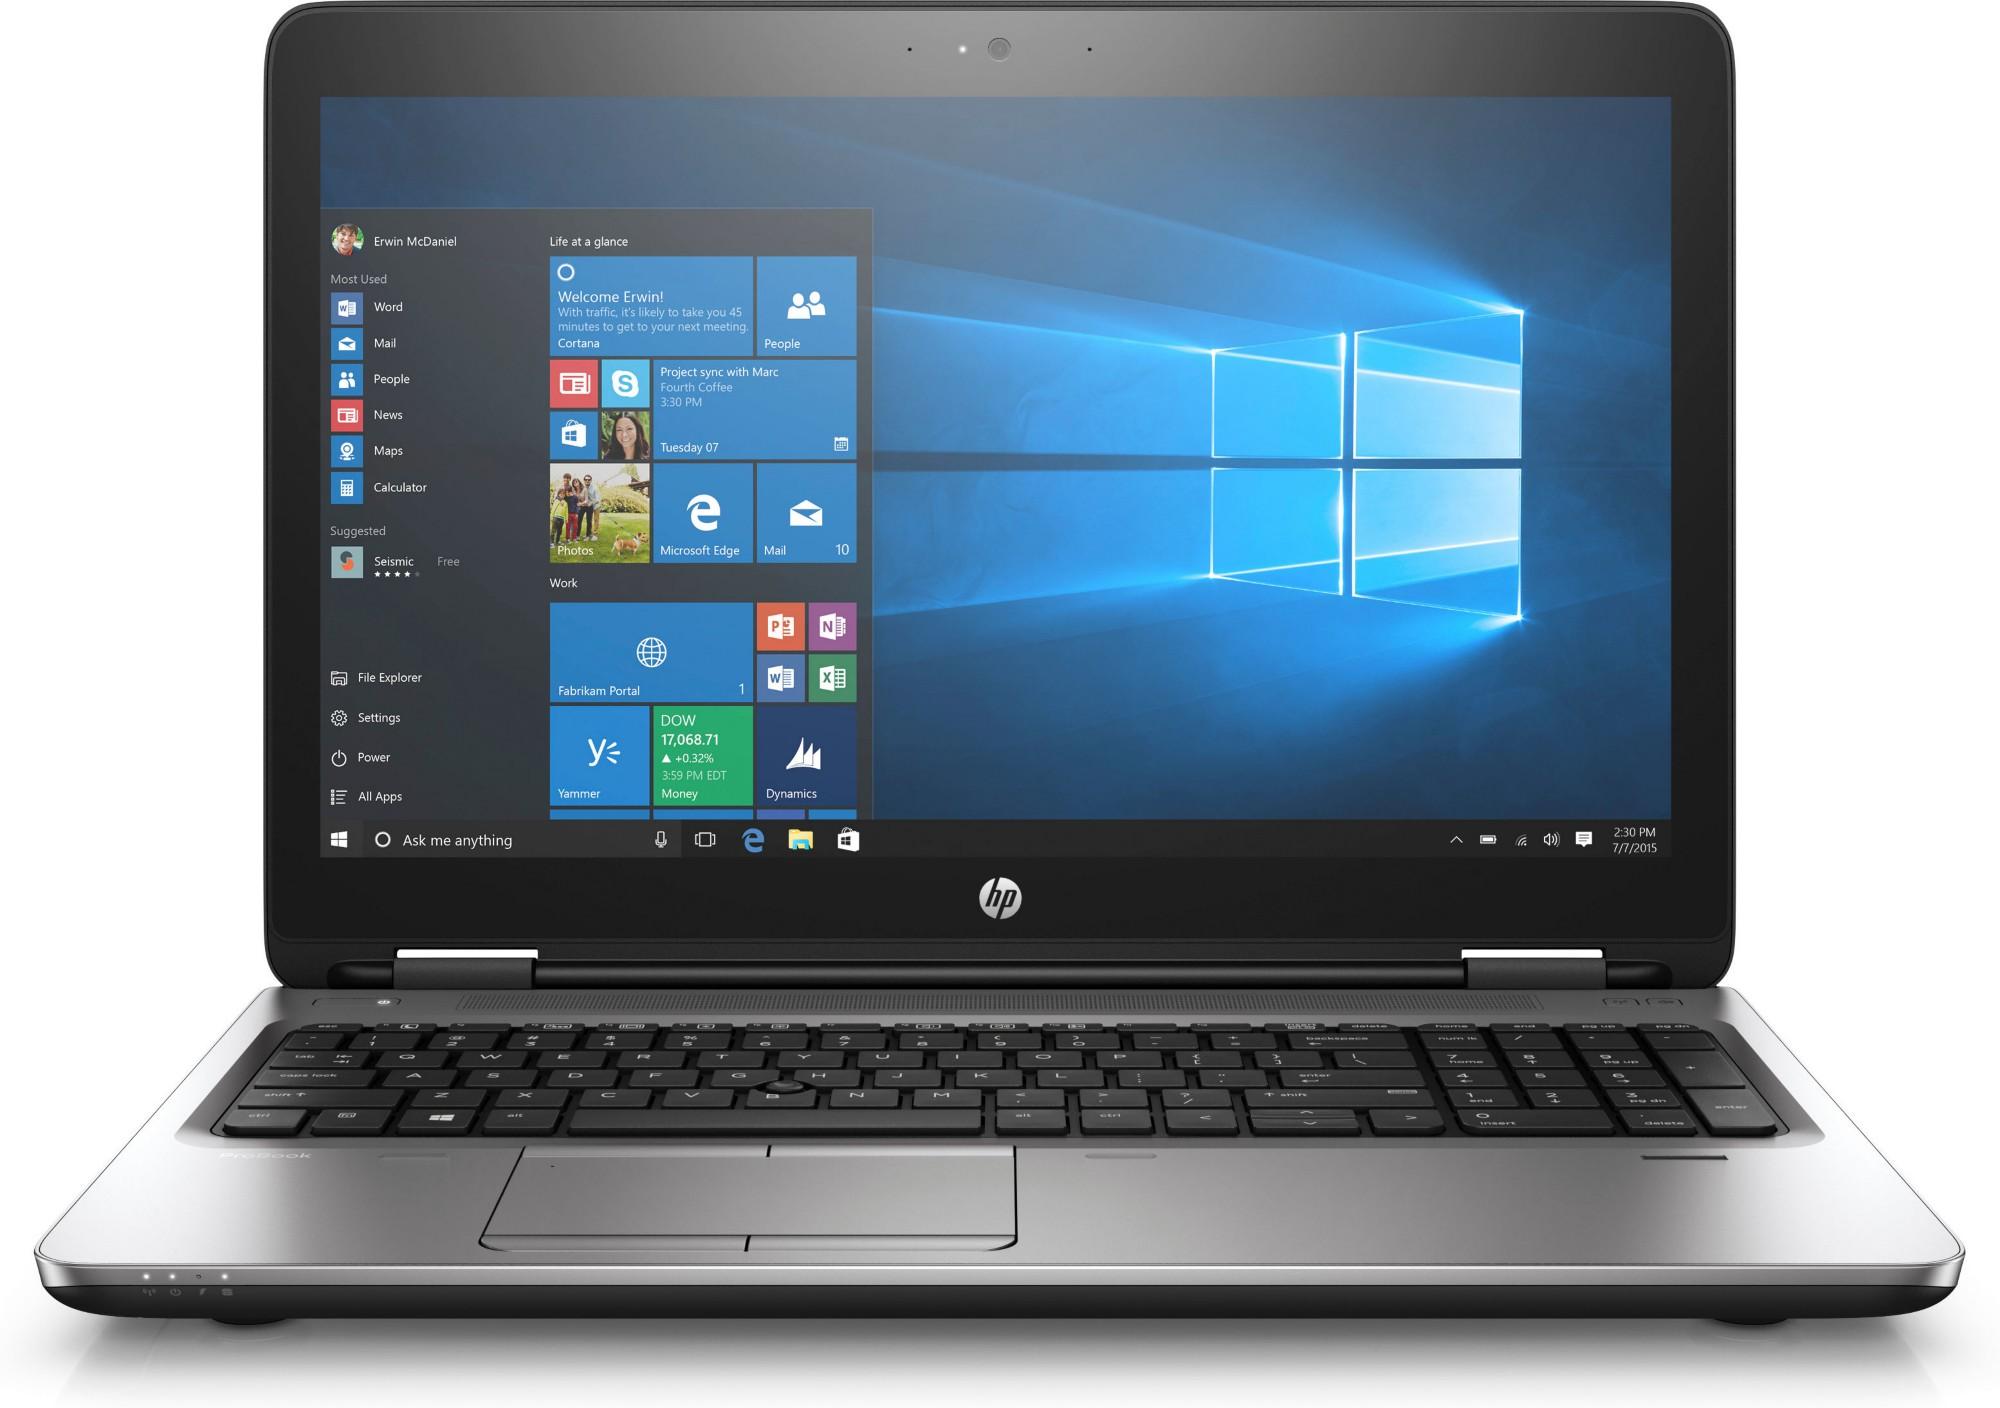 HP ProBook 650 G3 Notebook PC (ENERGY STAR)